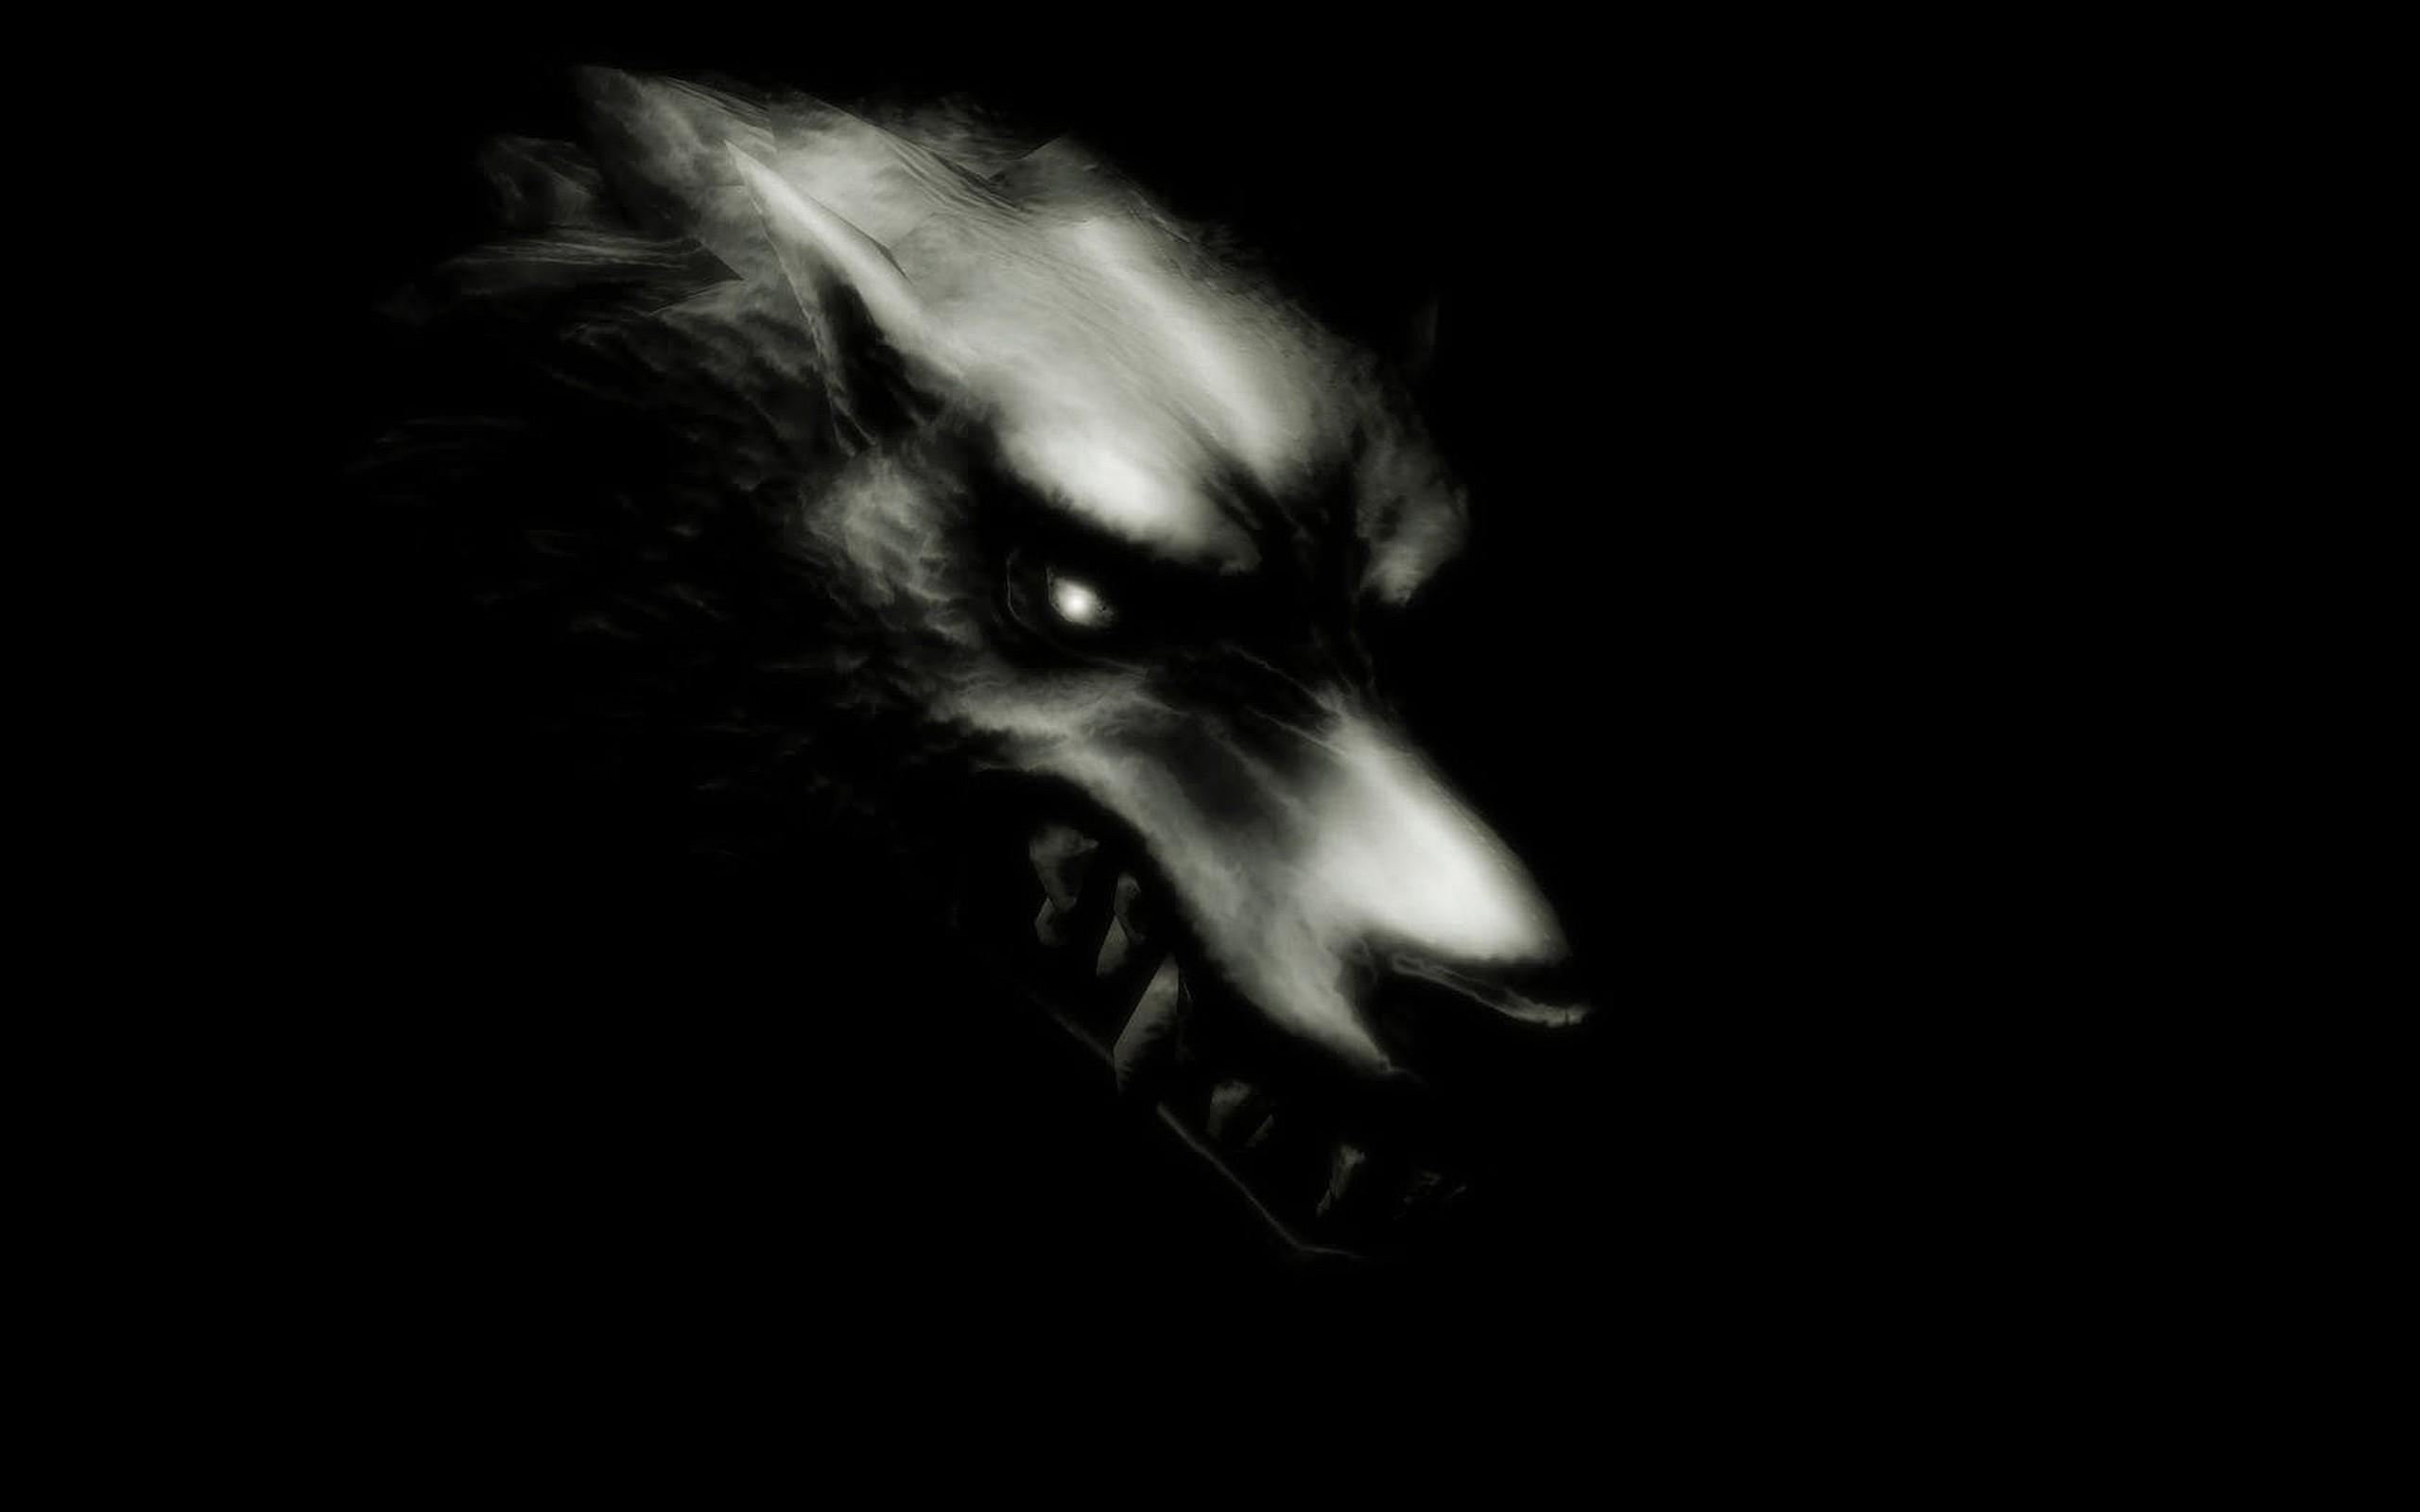 Van Helsing Werewolf Wallpapers Wallpaper | HD Wallpapers | Pinterest |  Werewolves, Hd wallpaper and Wallpaper